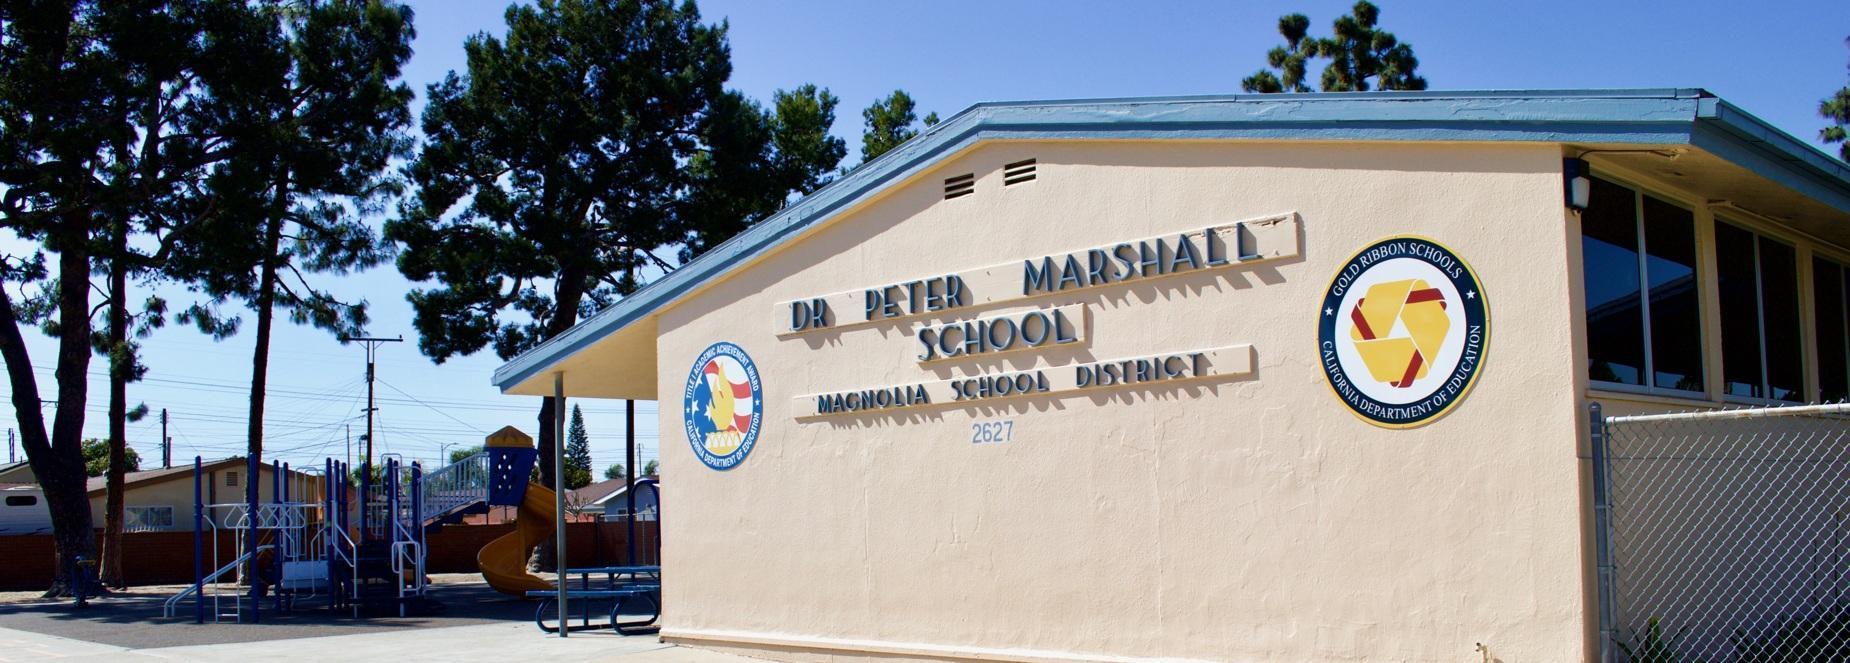 Dr  Peter Marshall School